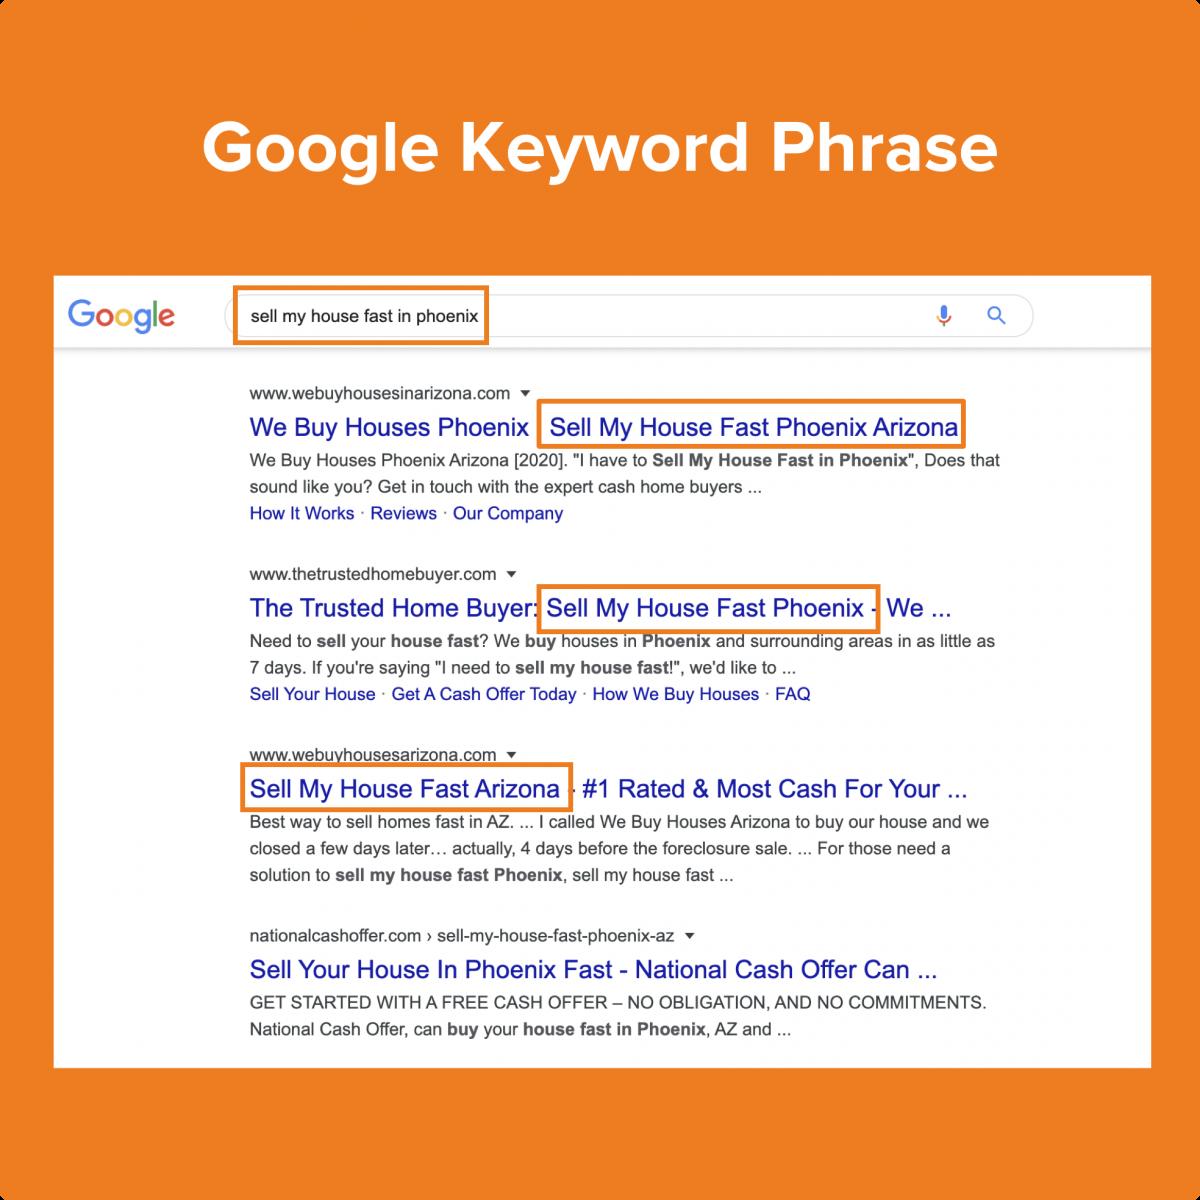 Google-Keyword-Phrase